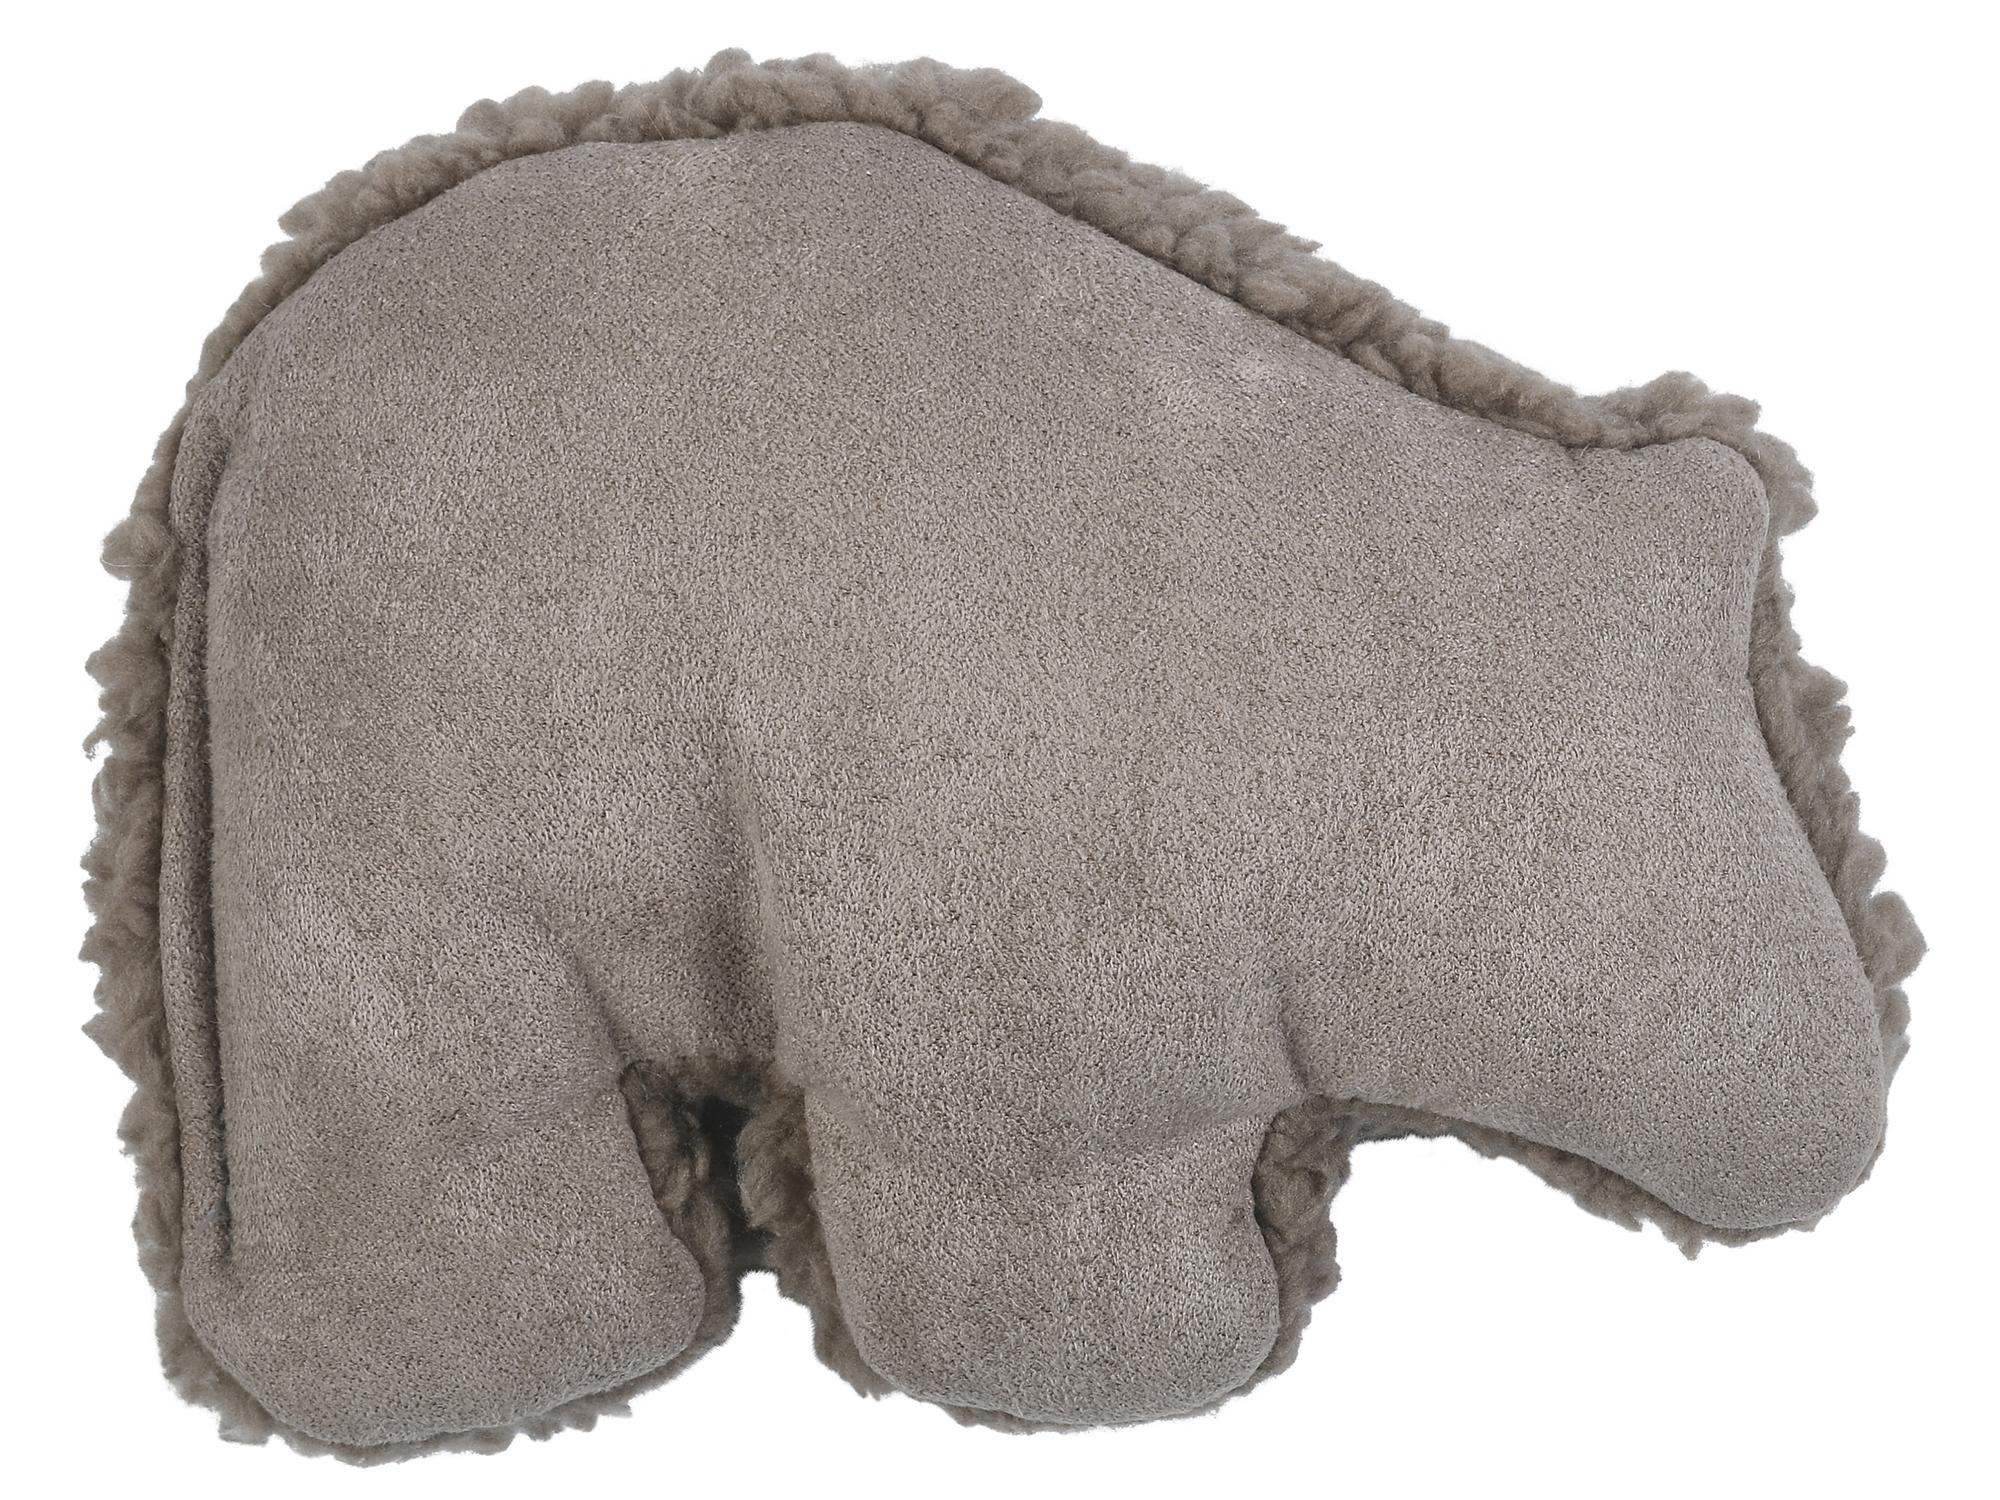 West Paw Big Sky Grizzly Bear Toy Dog Plush Toy, Oat, Small